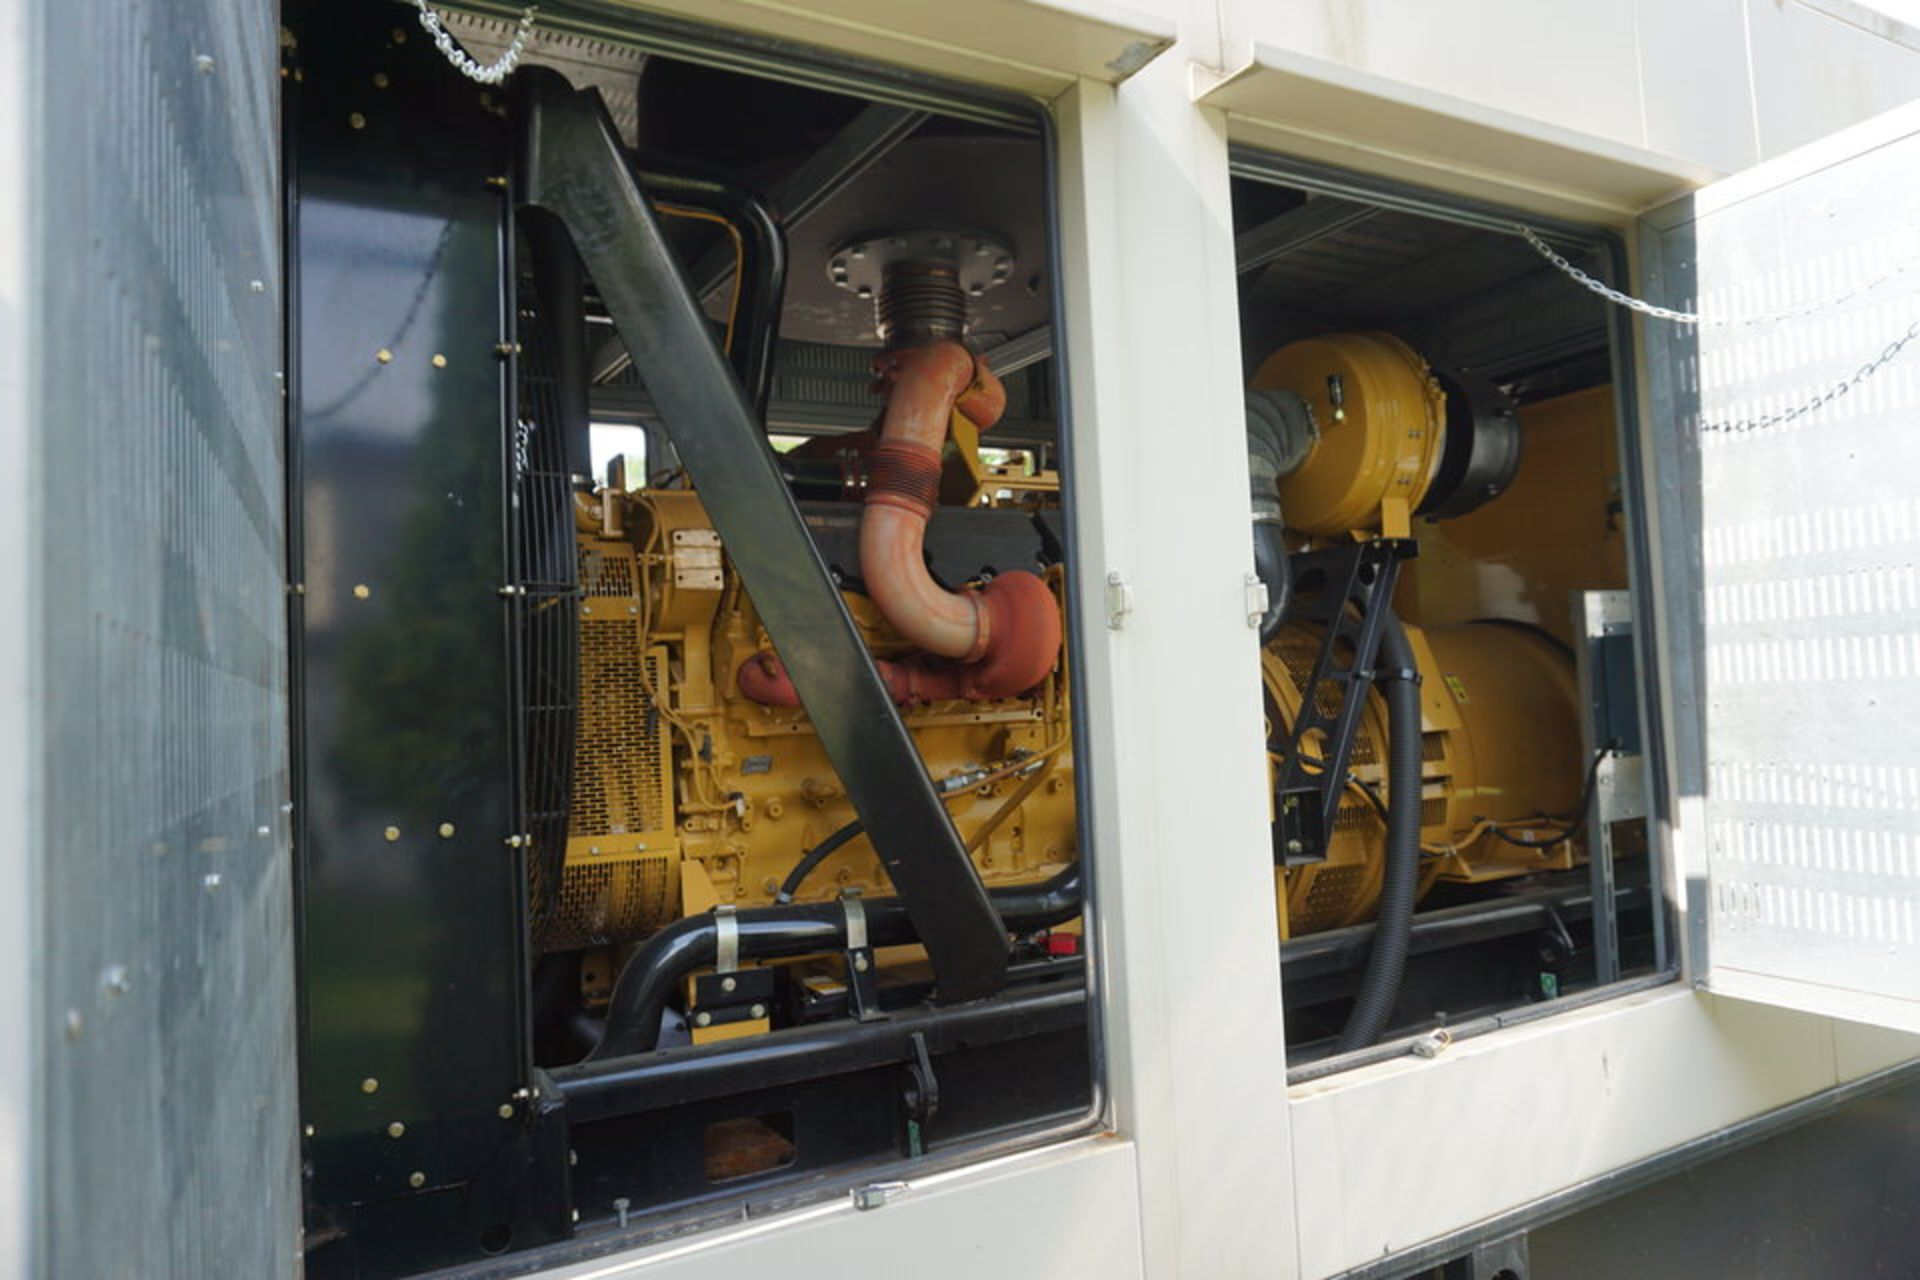 2007 CATERPILLAR BACK UP GENERATOR, ENGINE MODEL: C32 W/ EMCP3.3 CONTROL, 173.9 HOURS, 1250 KVA - Image 10 of 25